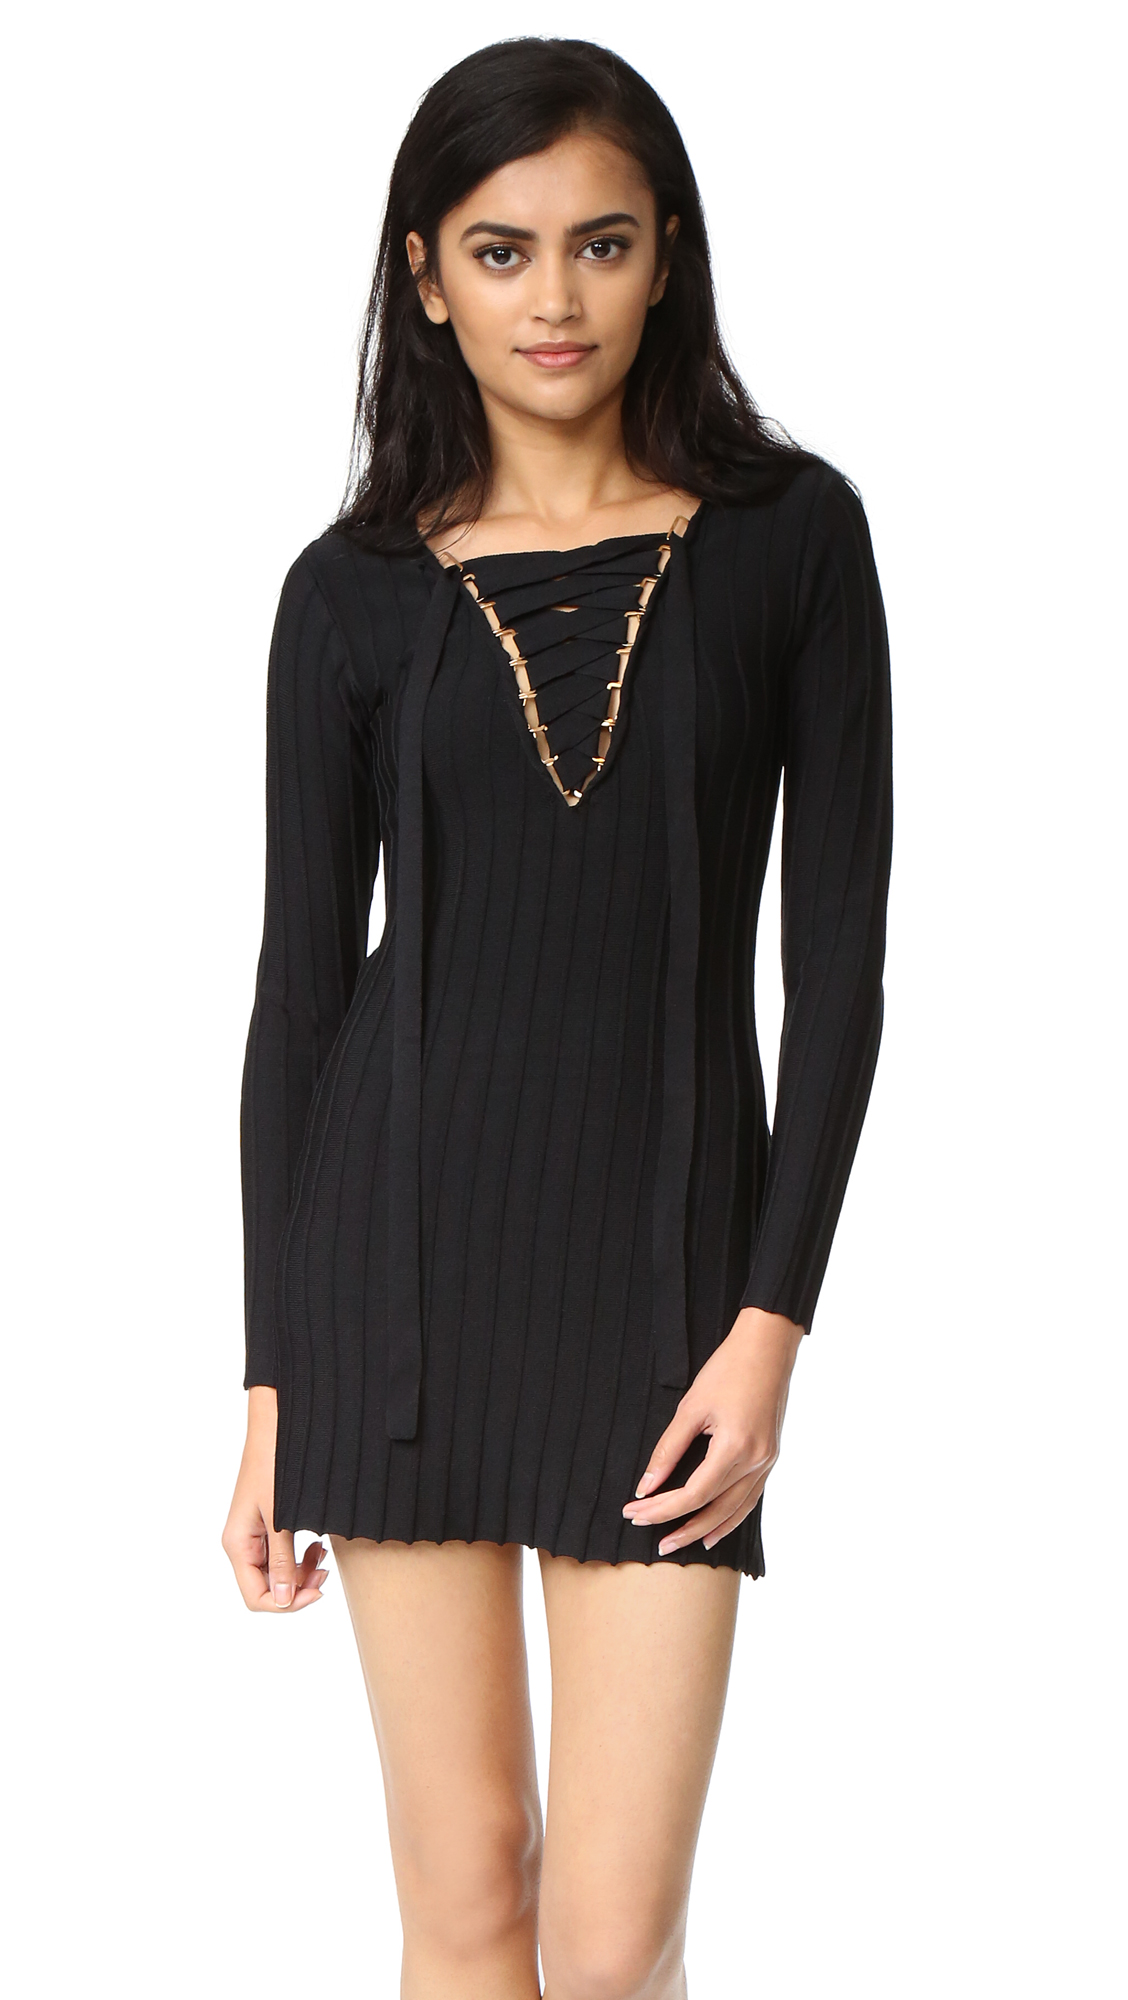 Letra the hollies long cool woman in a black dress traducida